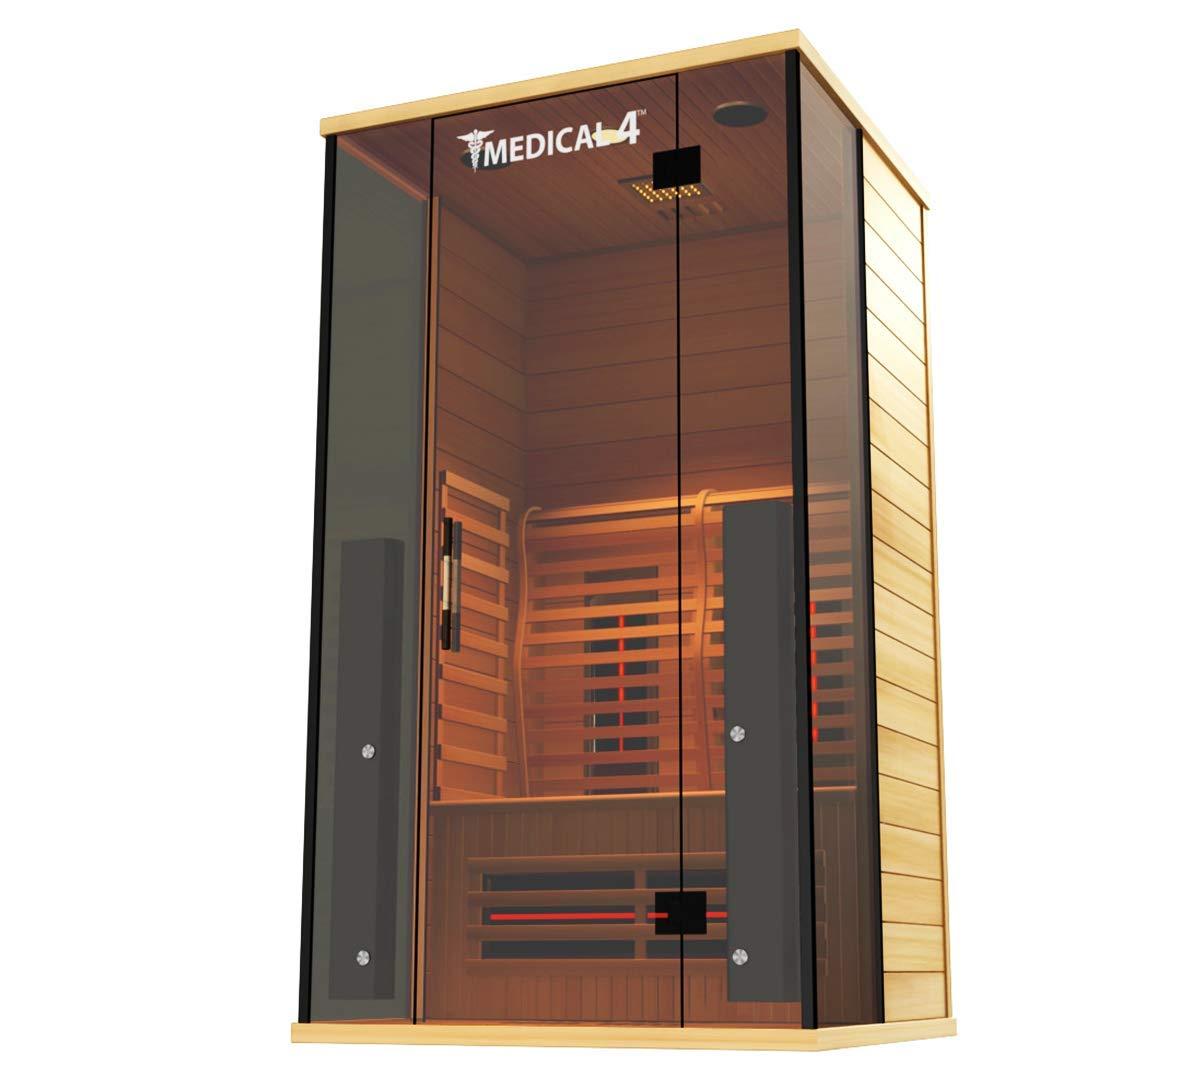 Medical Sauna 4 Full Spectrum Home Sauna – 2 Person Indoor Infrared Sauna Spa Oxygen Ionizer, Chromatic Light Therapy, Hot Yoga Audio System Full Spectrum, Carbon Heaters Luxury Sauna